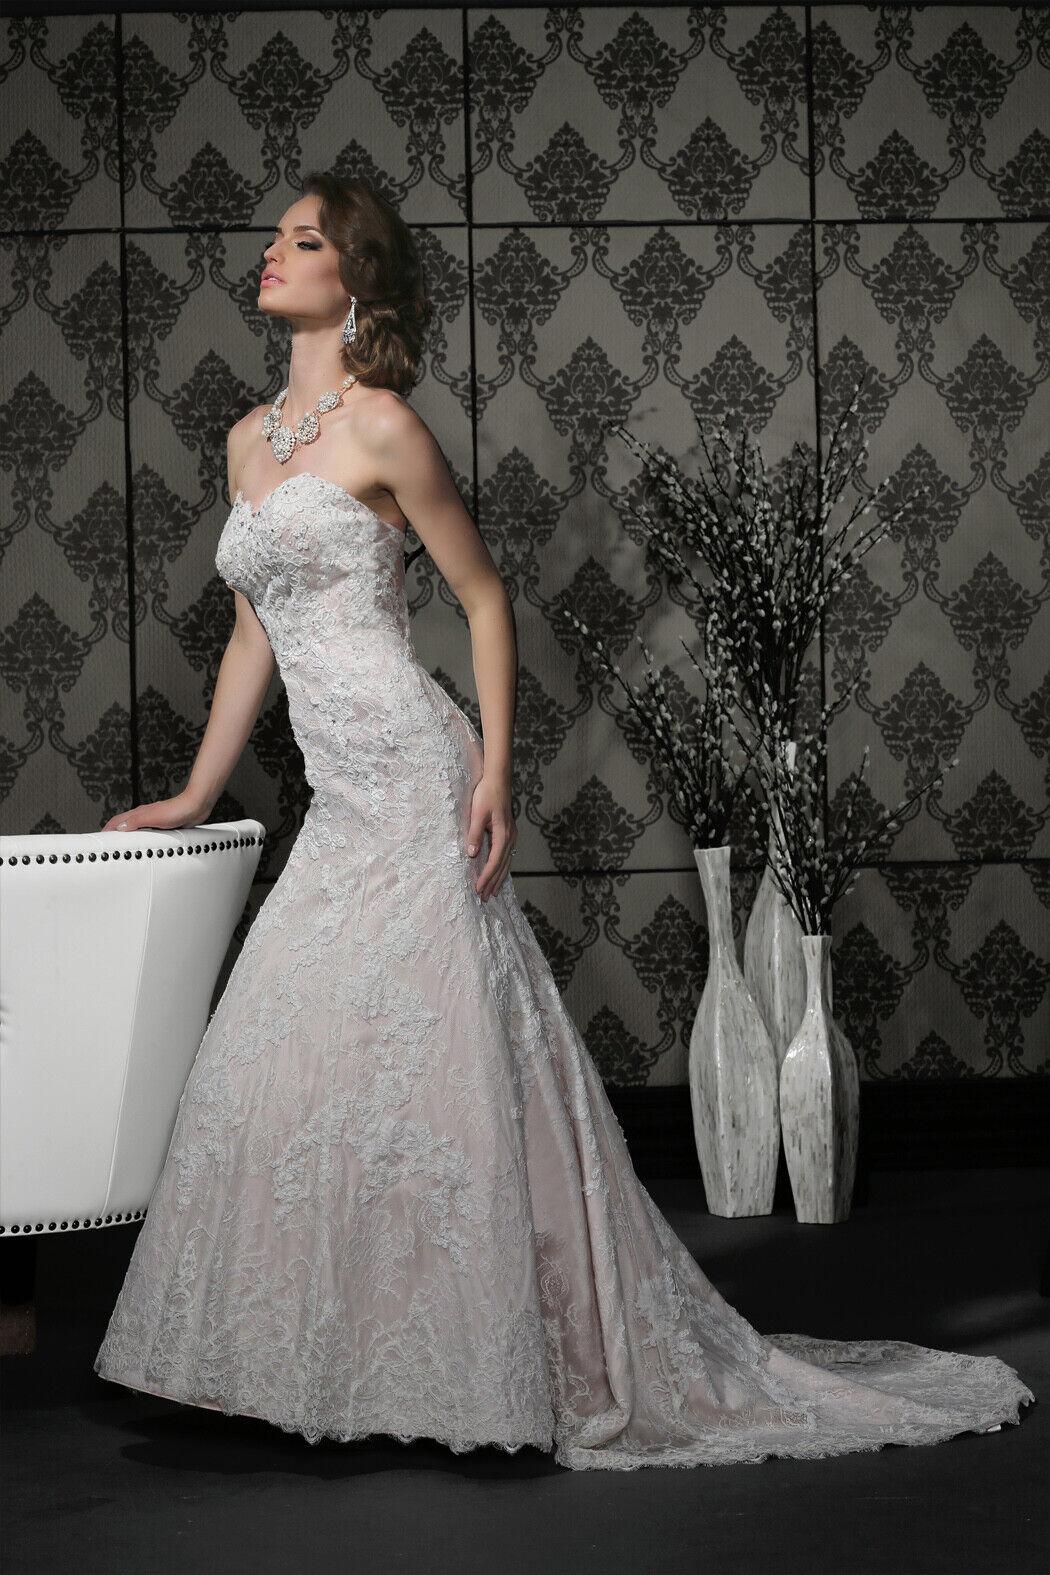 Impression Bridal Gown 10296 - Ivory/Ivory Size 10 NWT